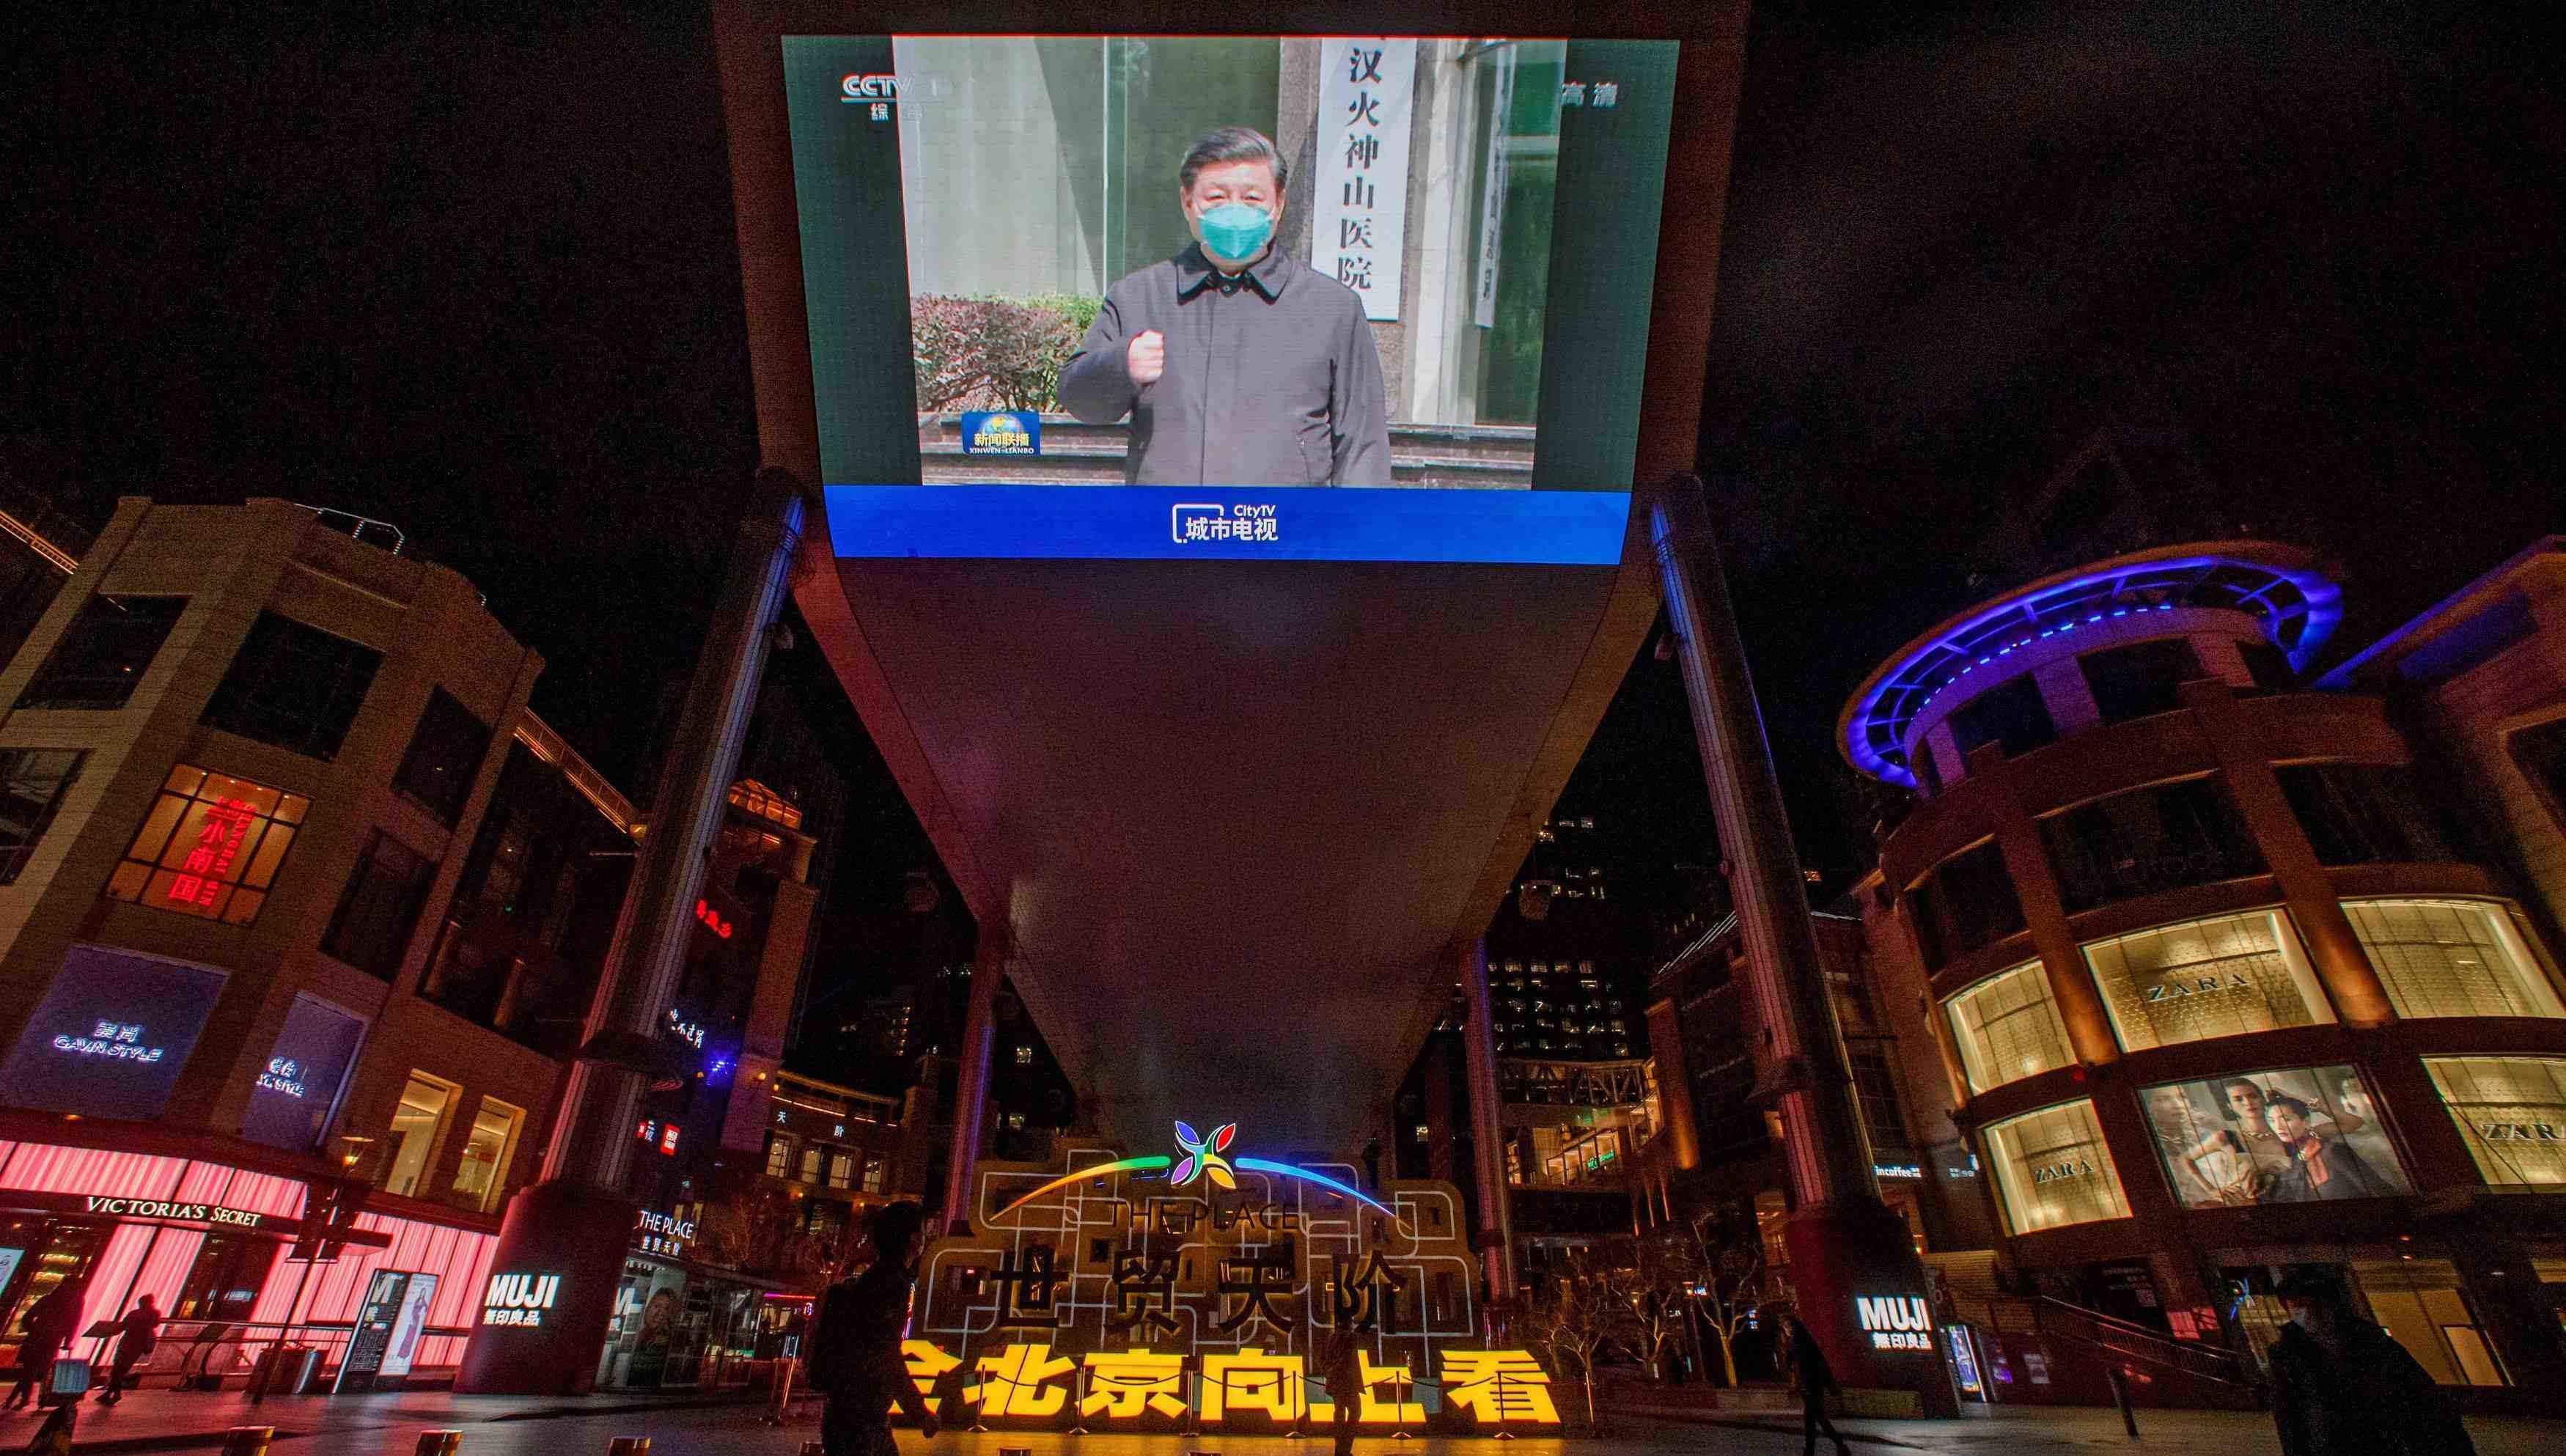 China Xi Jinping and Coronavirus 002